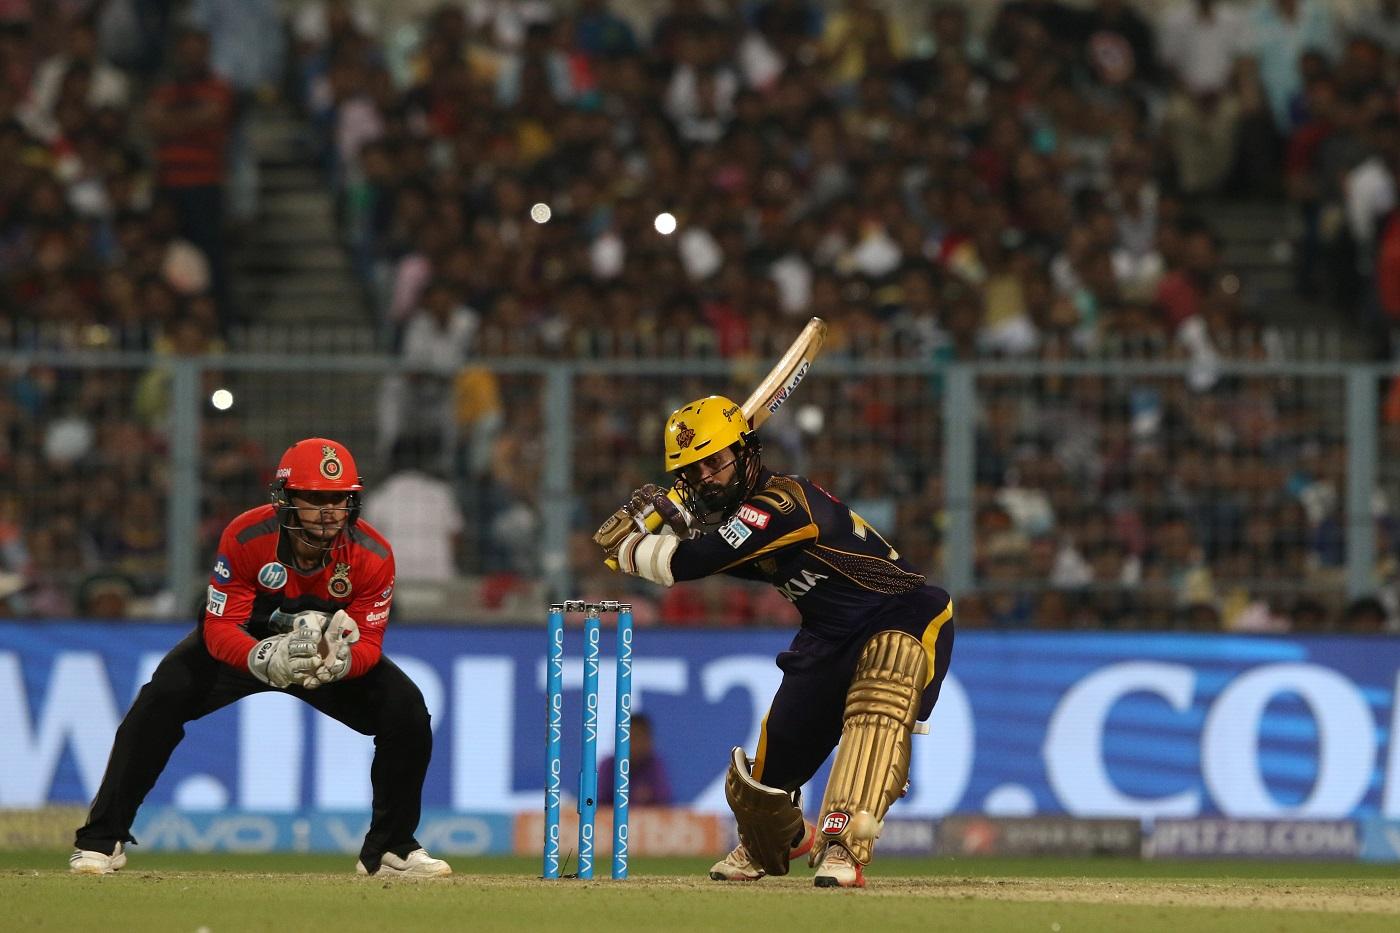 KKR Vs RCB IPL 2018 MATCH No 3